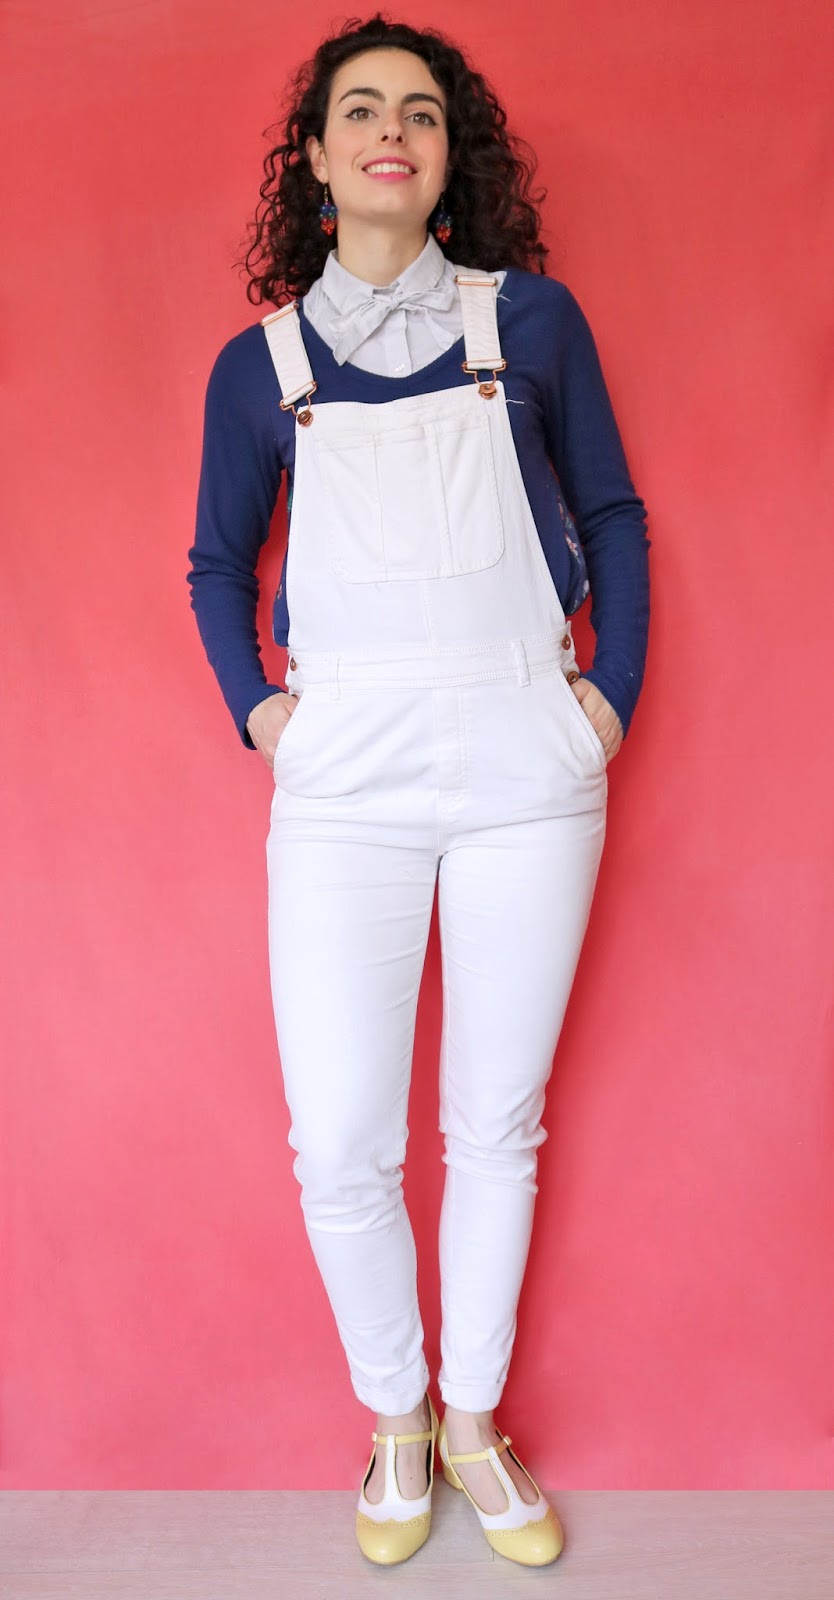 salopette blanche H&M, Chemisier ASOS, haut bleu Modcloth, chaussures jaunes Lulu Hun